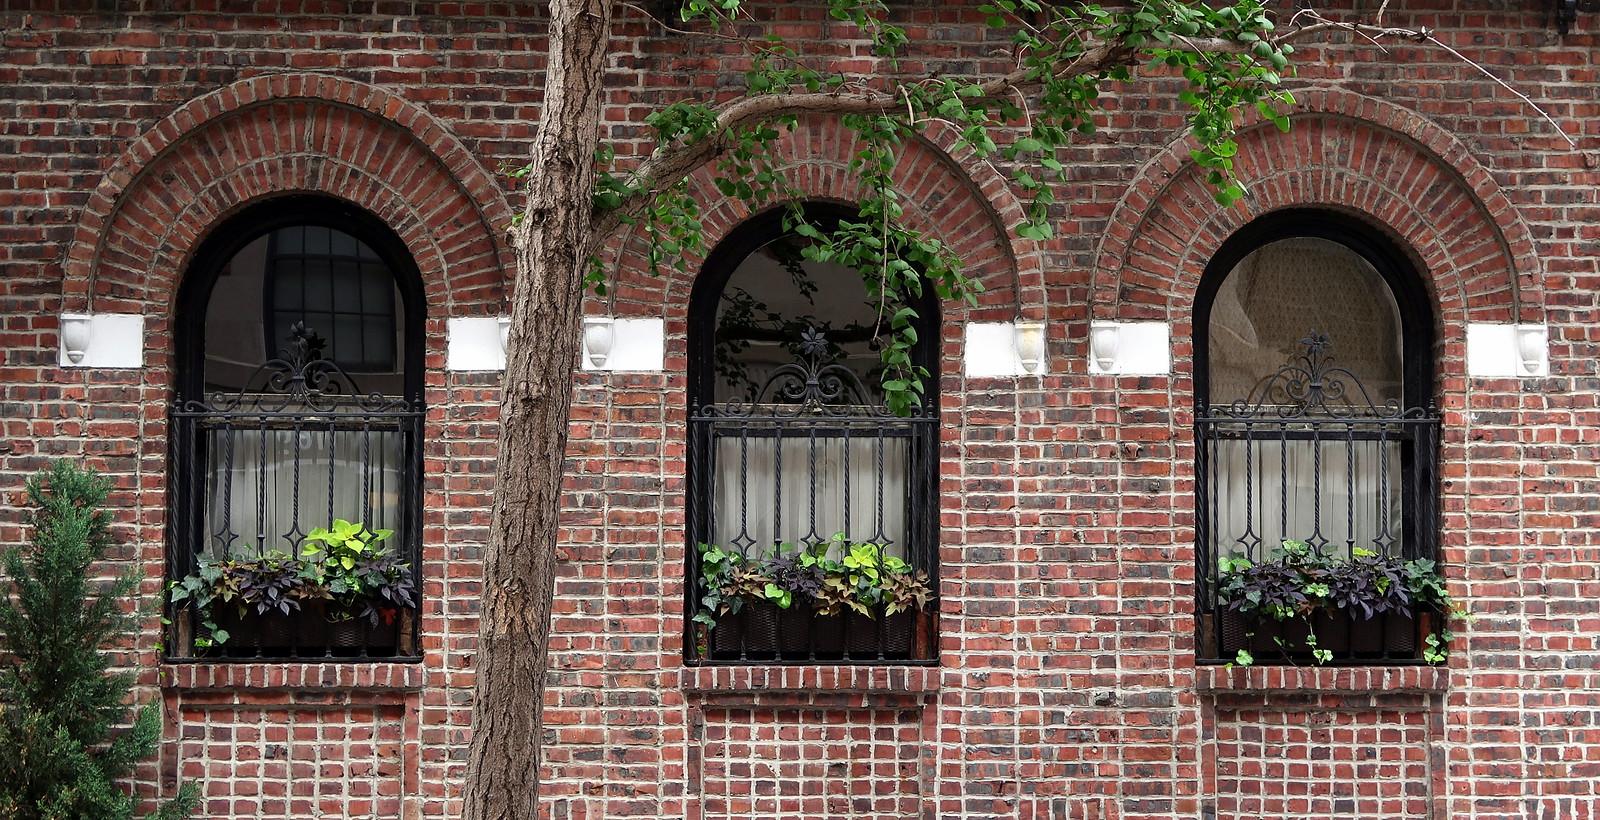 Windows arched with narrow brickwork, 169 West 12th Street (1922), Greenwich Village, New York